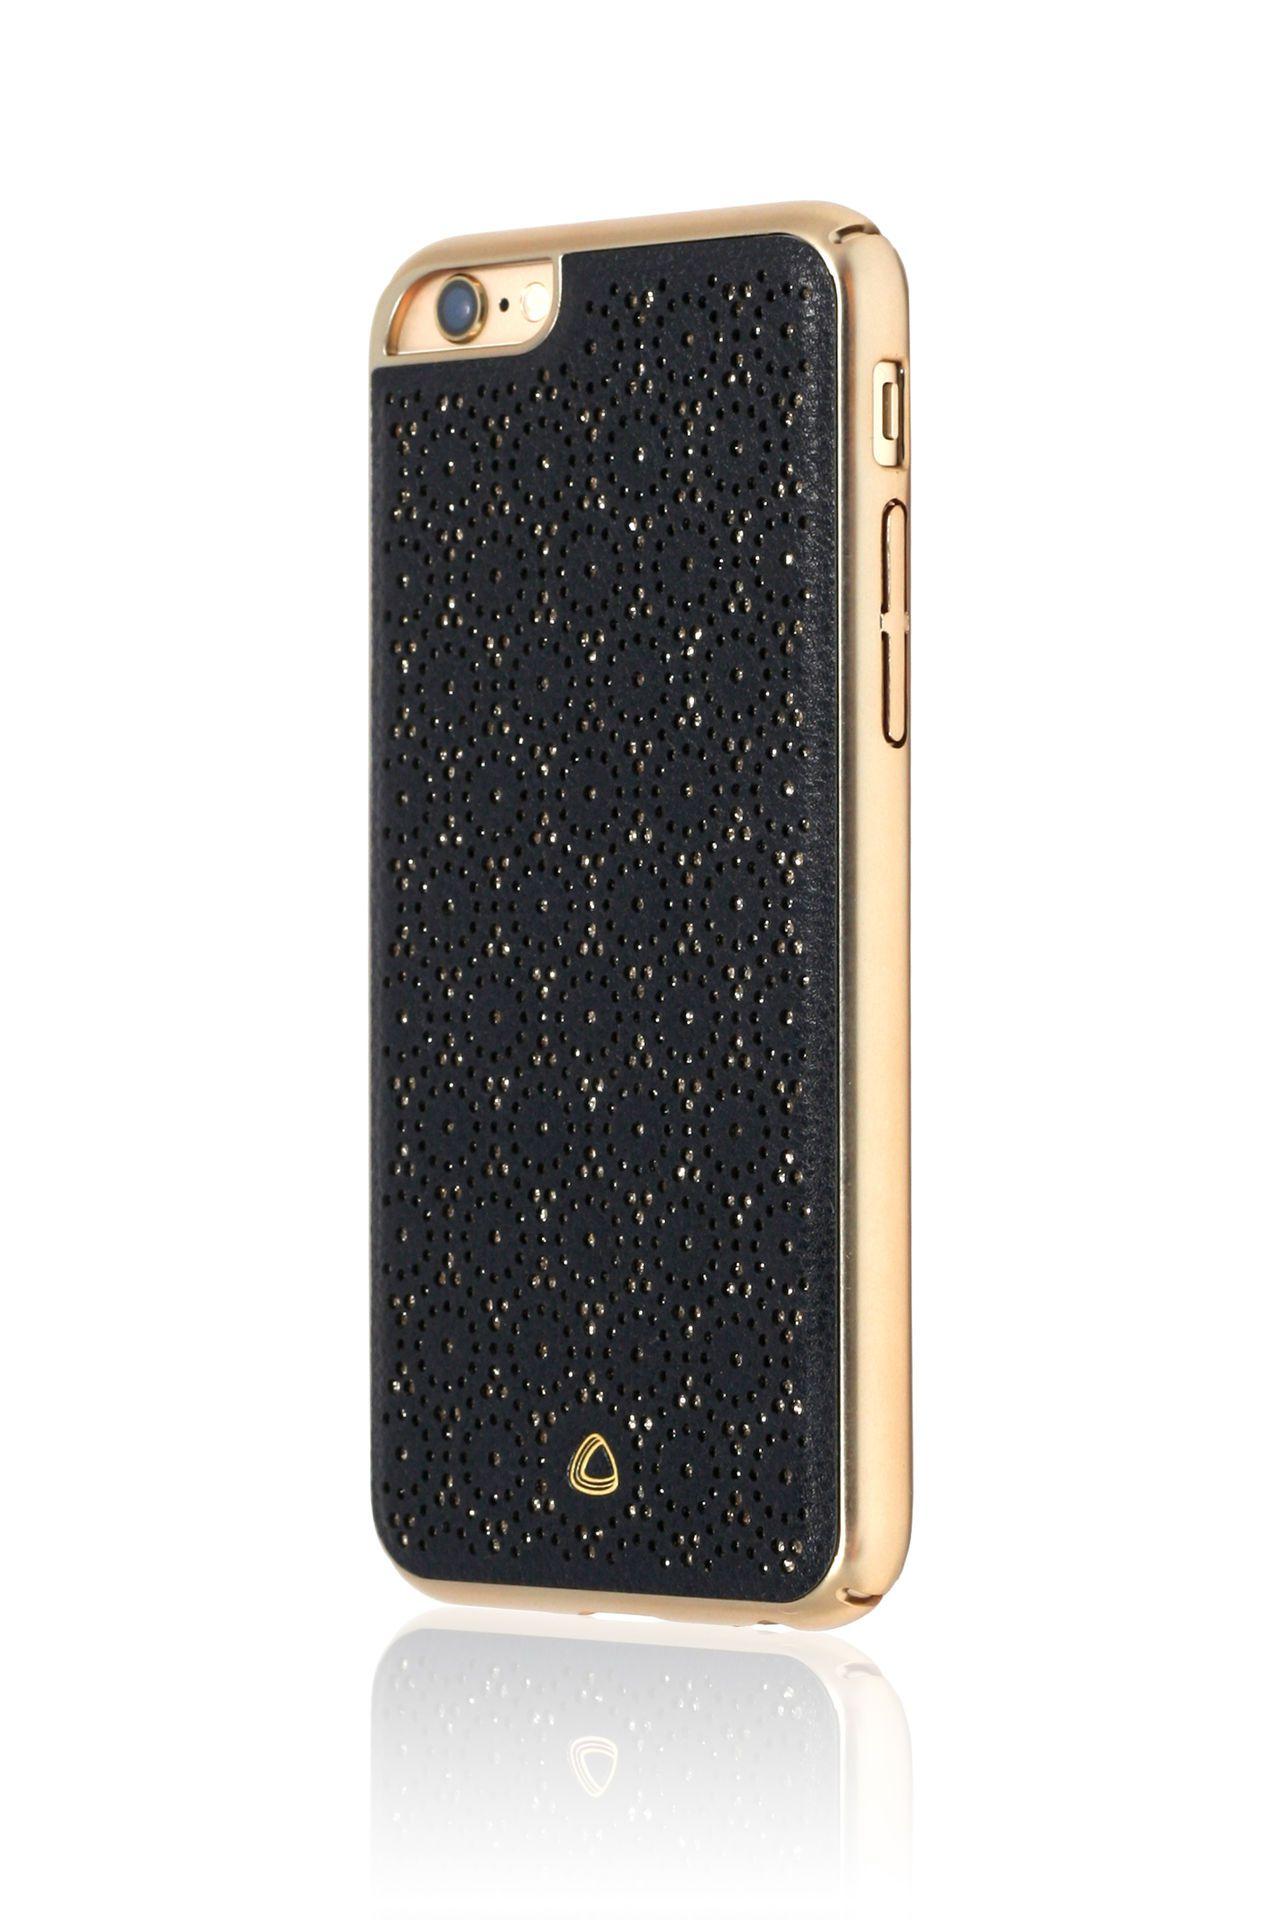 OCCA Ferragamo Series Designer Back Cover Mobile Phone Case for iPhone 6 6s Black